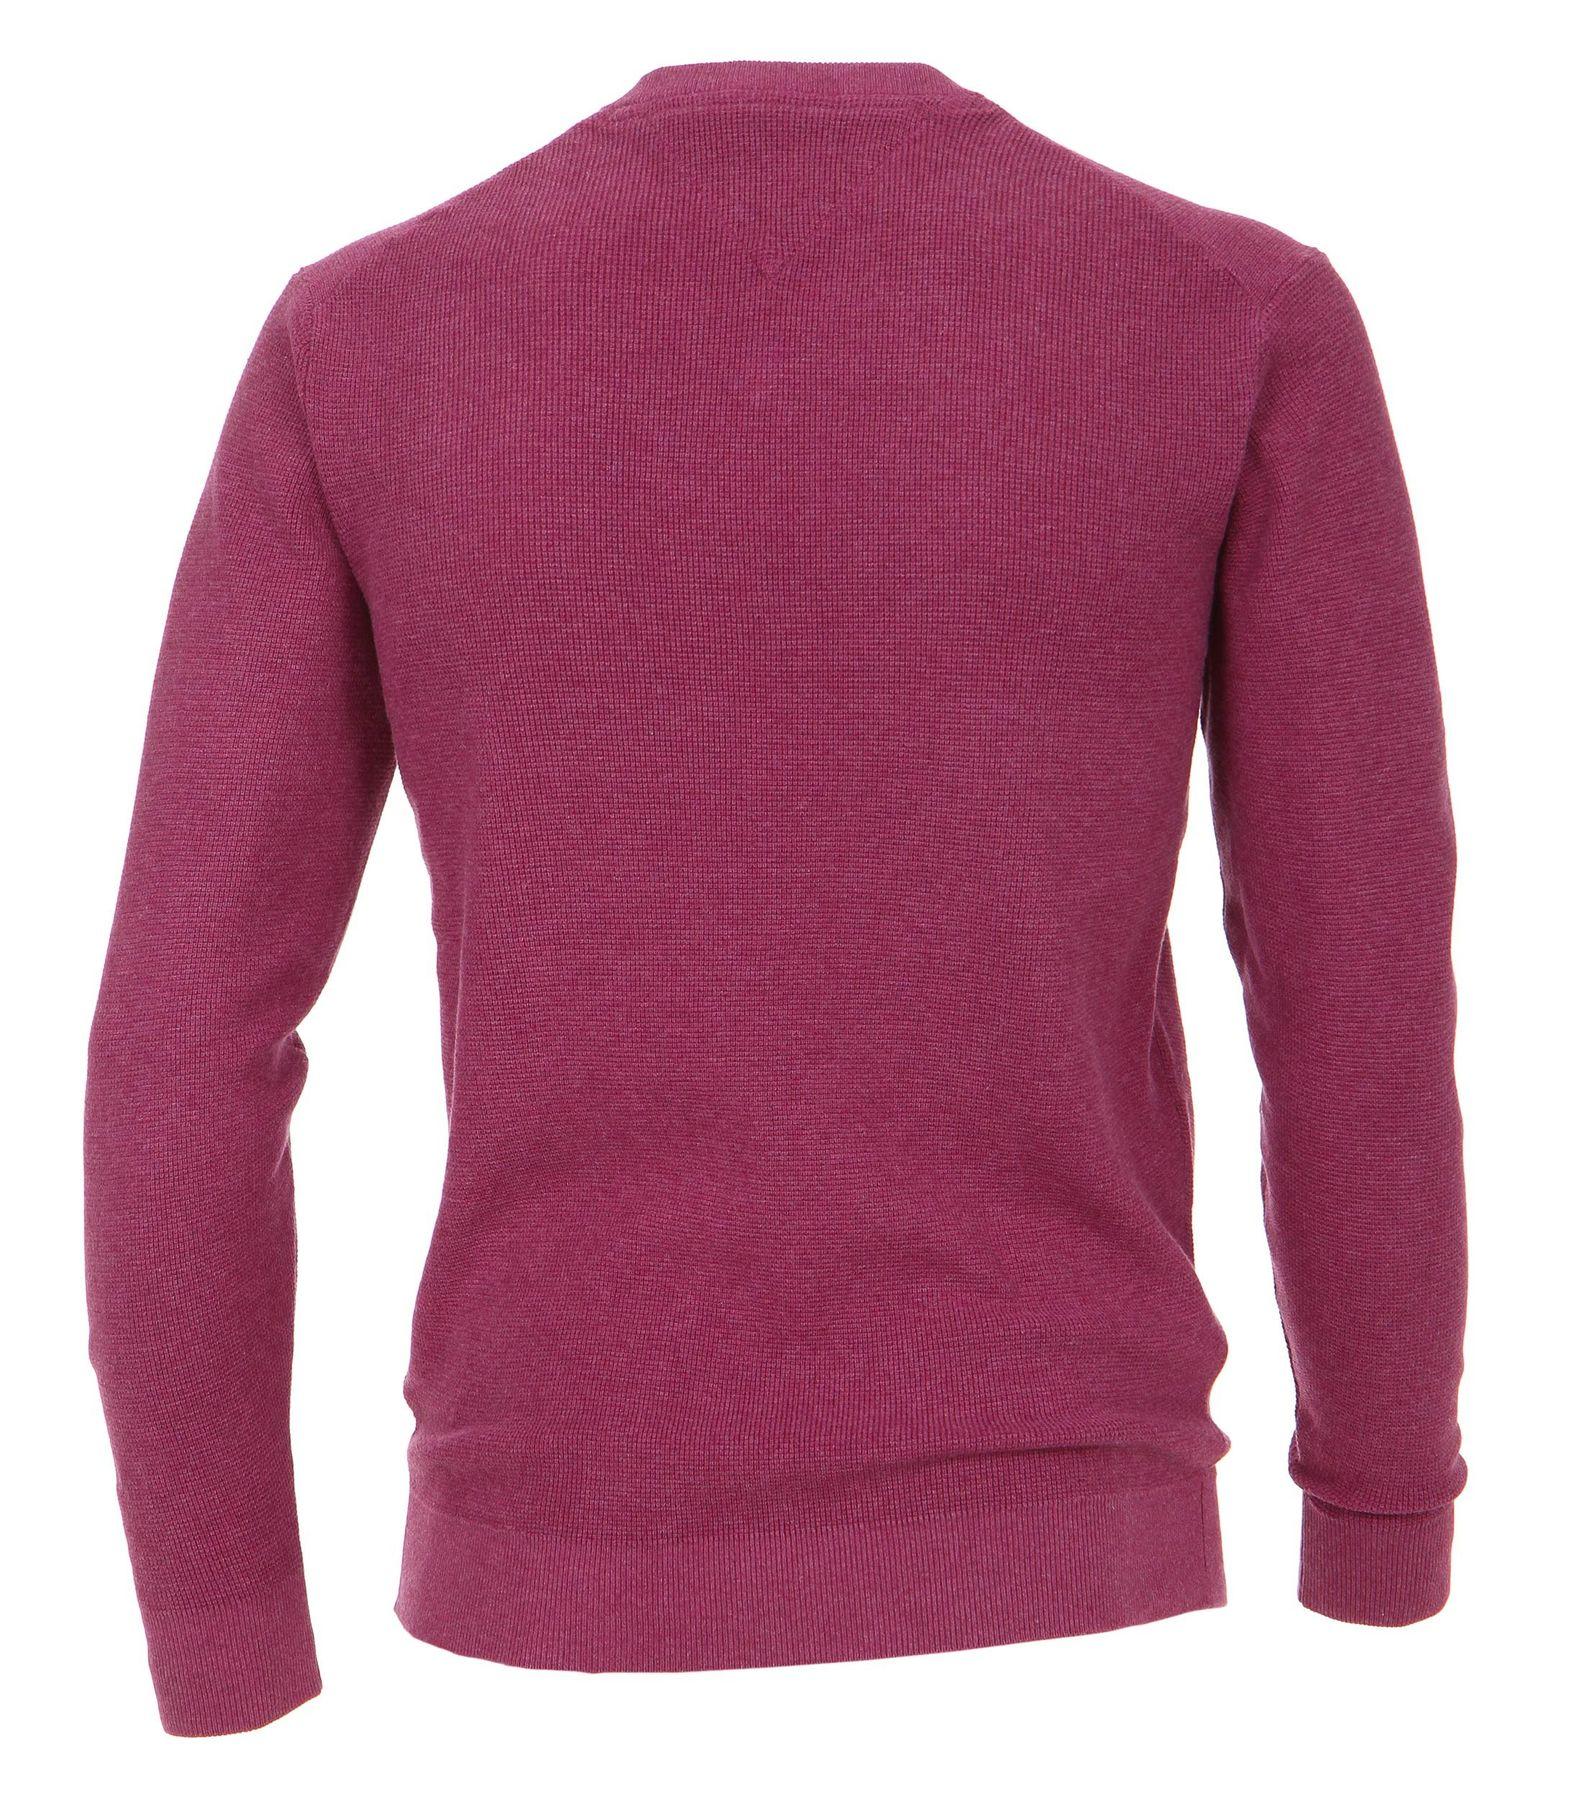 Casa Moda - Unifarbener Herren Pullover mit V-Ausschnitt  (472625000A) – Bild 17